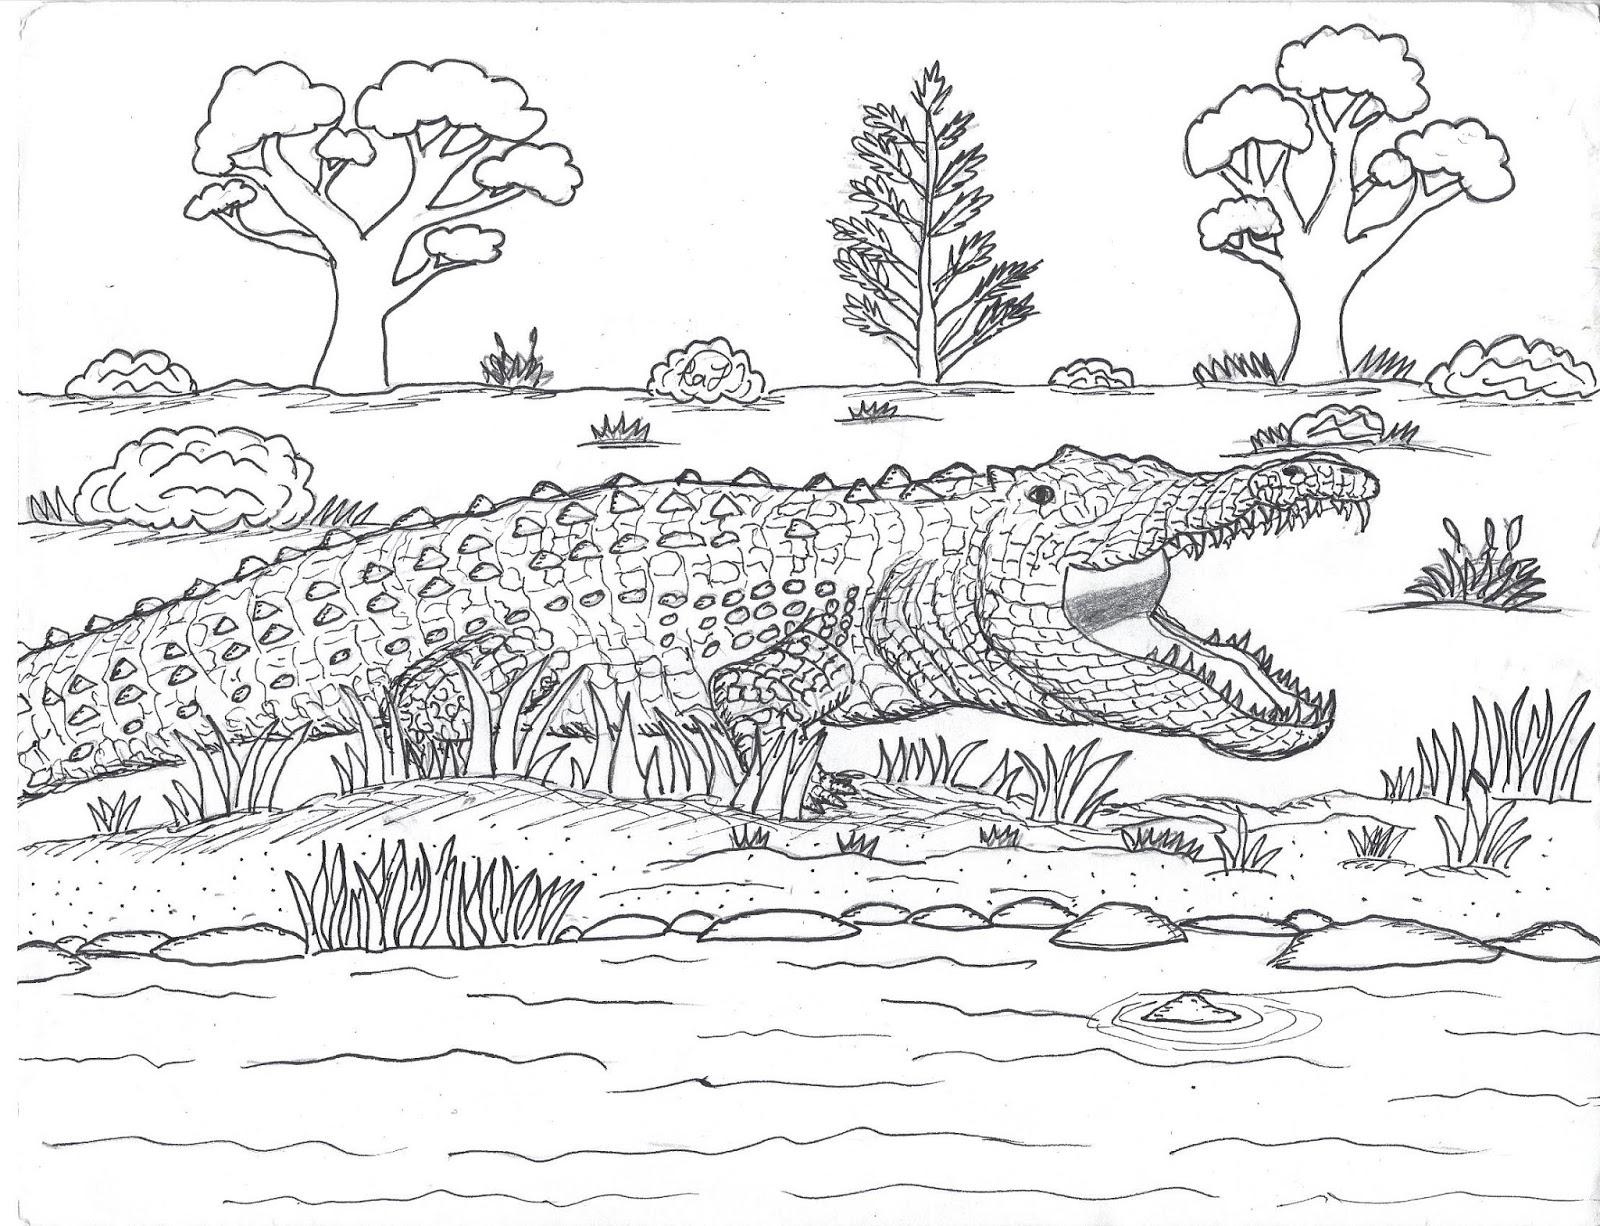 Sarcosuchus - Prehistoric Crocodile coloring page | Free Printable ... | 1226x1600